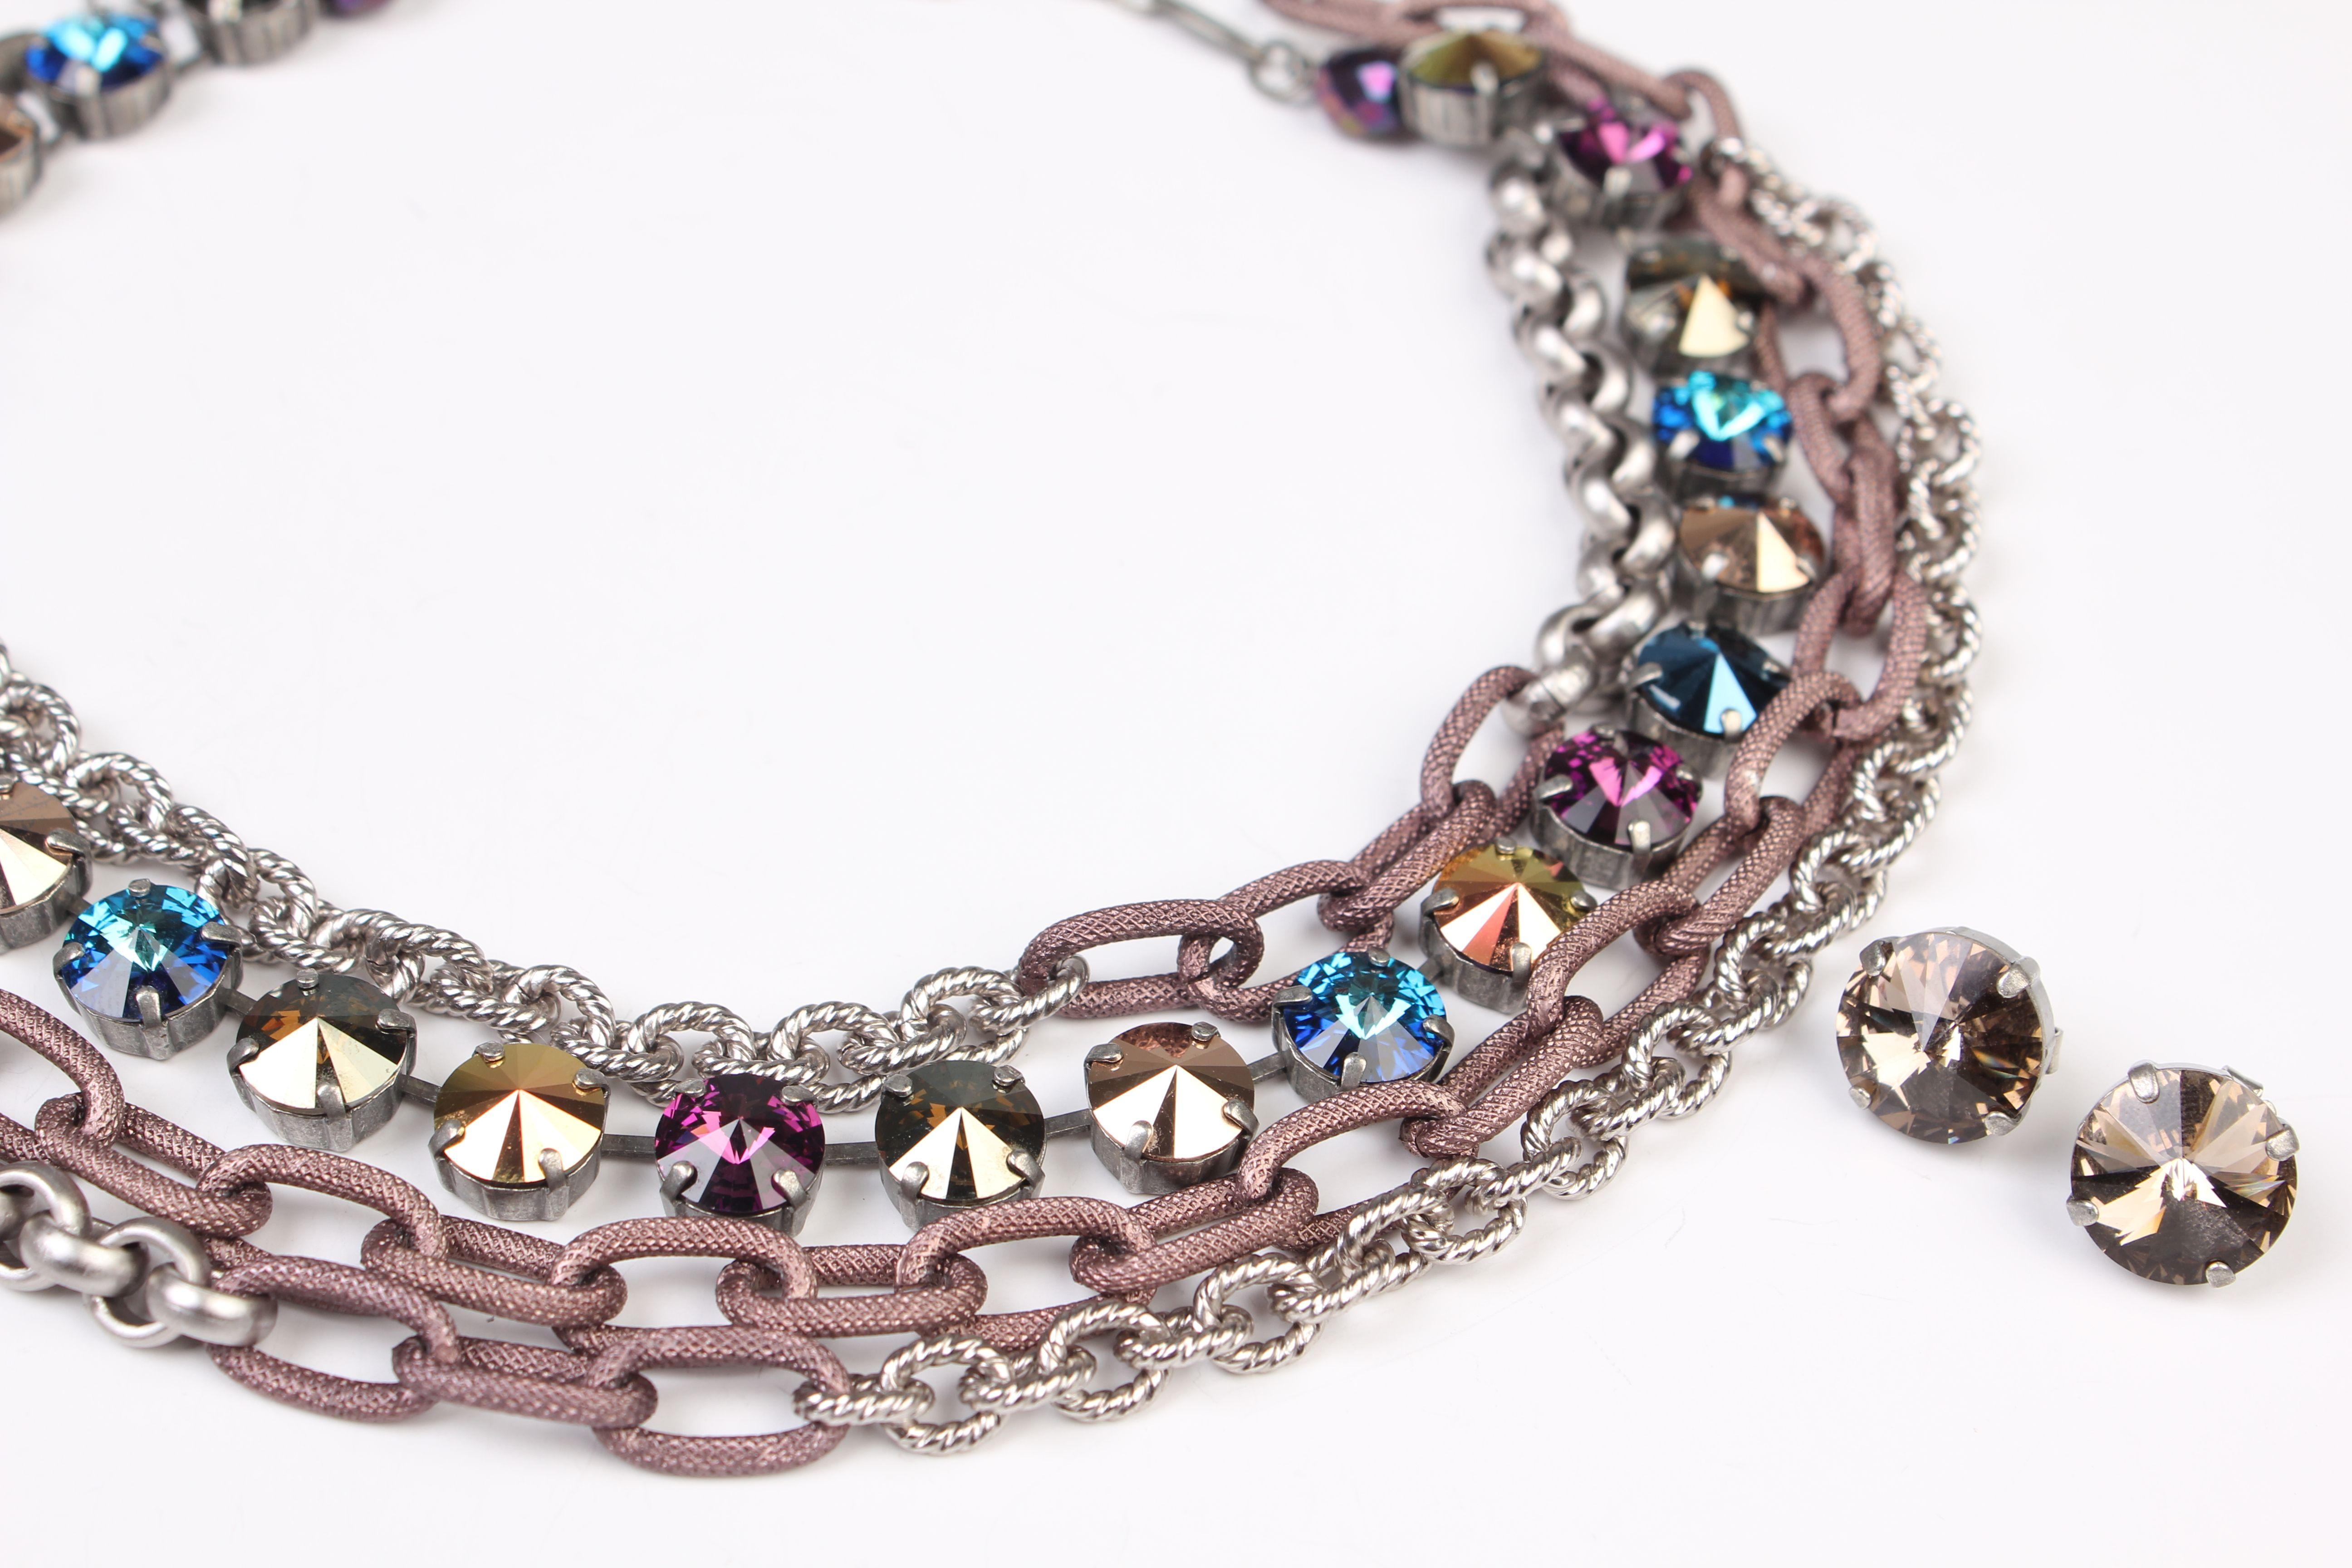 Sabika look necklace - Global Stage Manhattan Choker Paired With Sahara Dusk 3 Row Necklace And Sahara Dusk Sabika